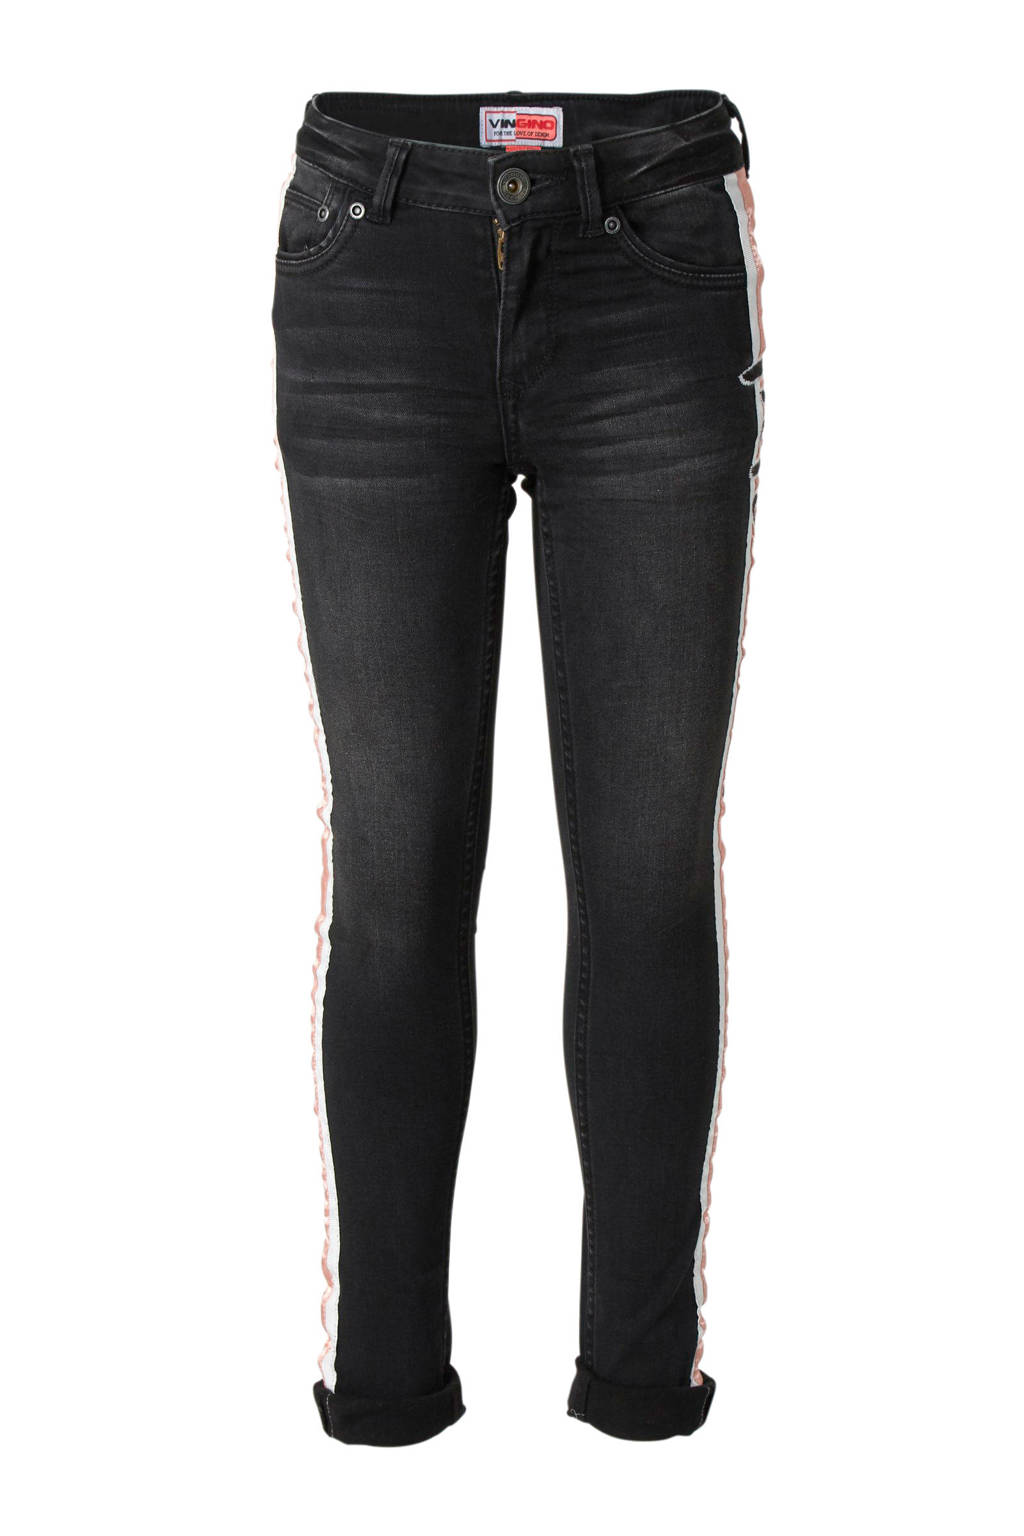 Vingino super skinny jeans Beata met zijstreep, Black Vintage